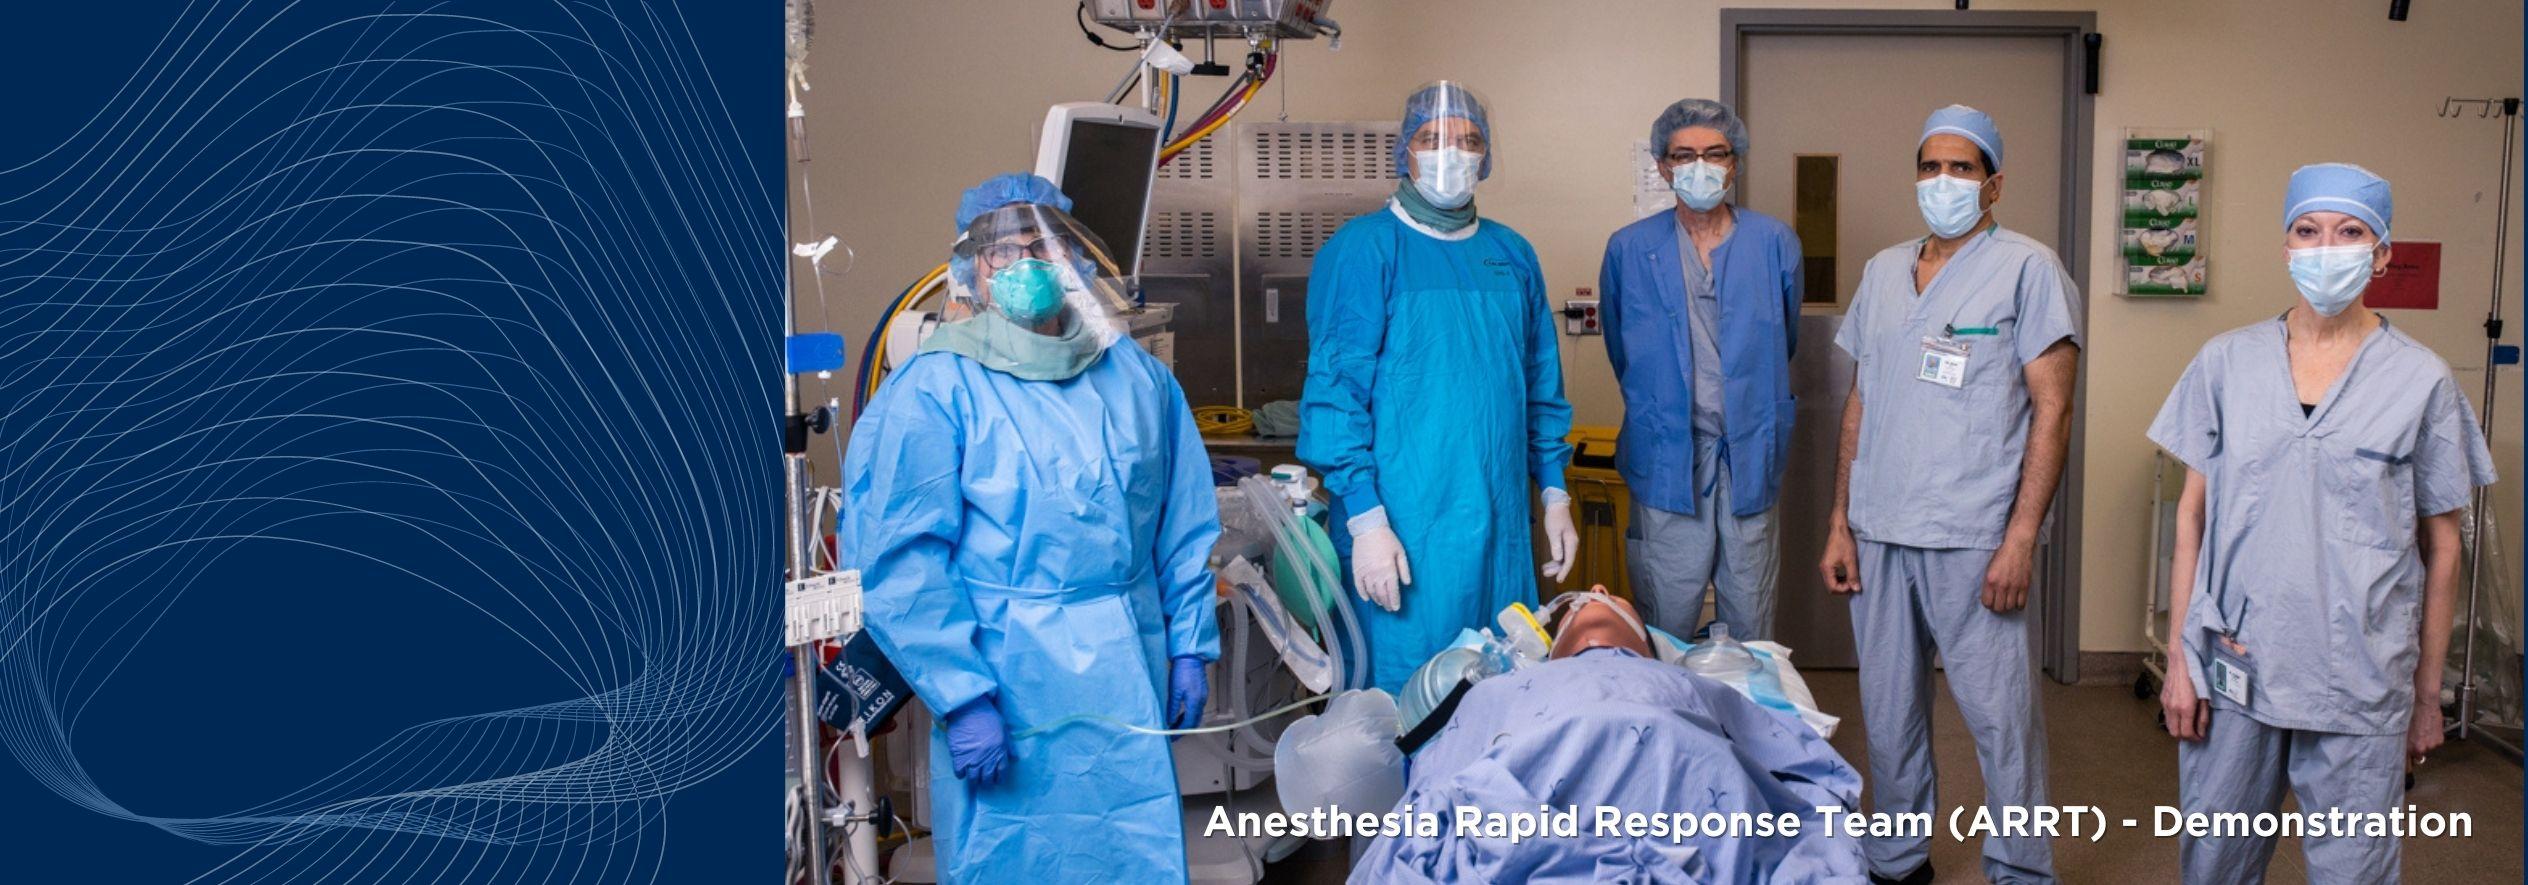 Anesthesia Rapid Response Team (ARRT)